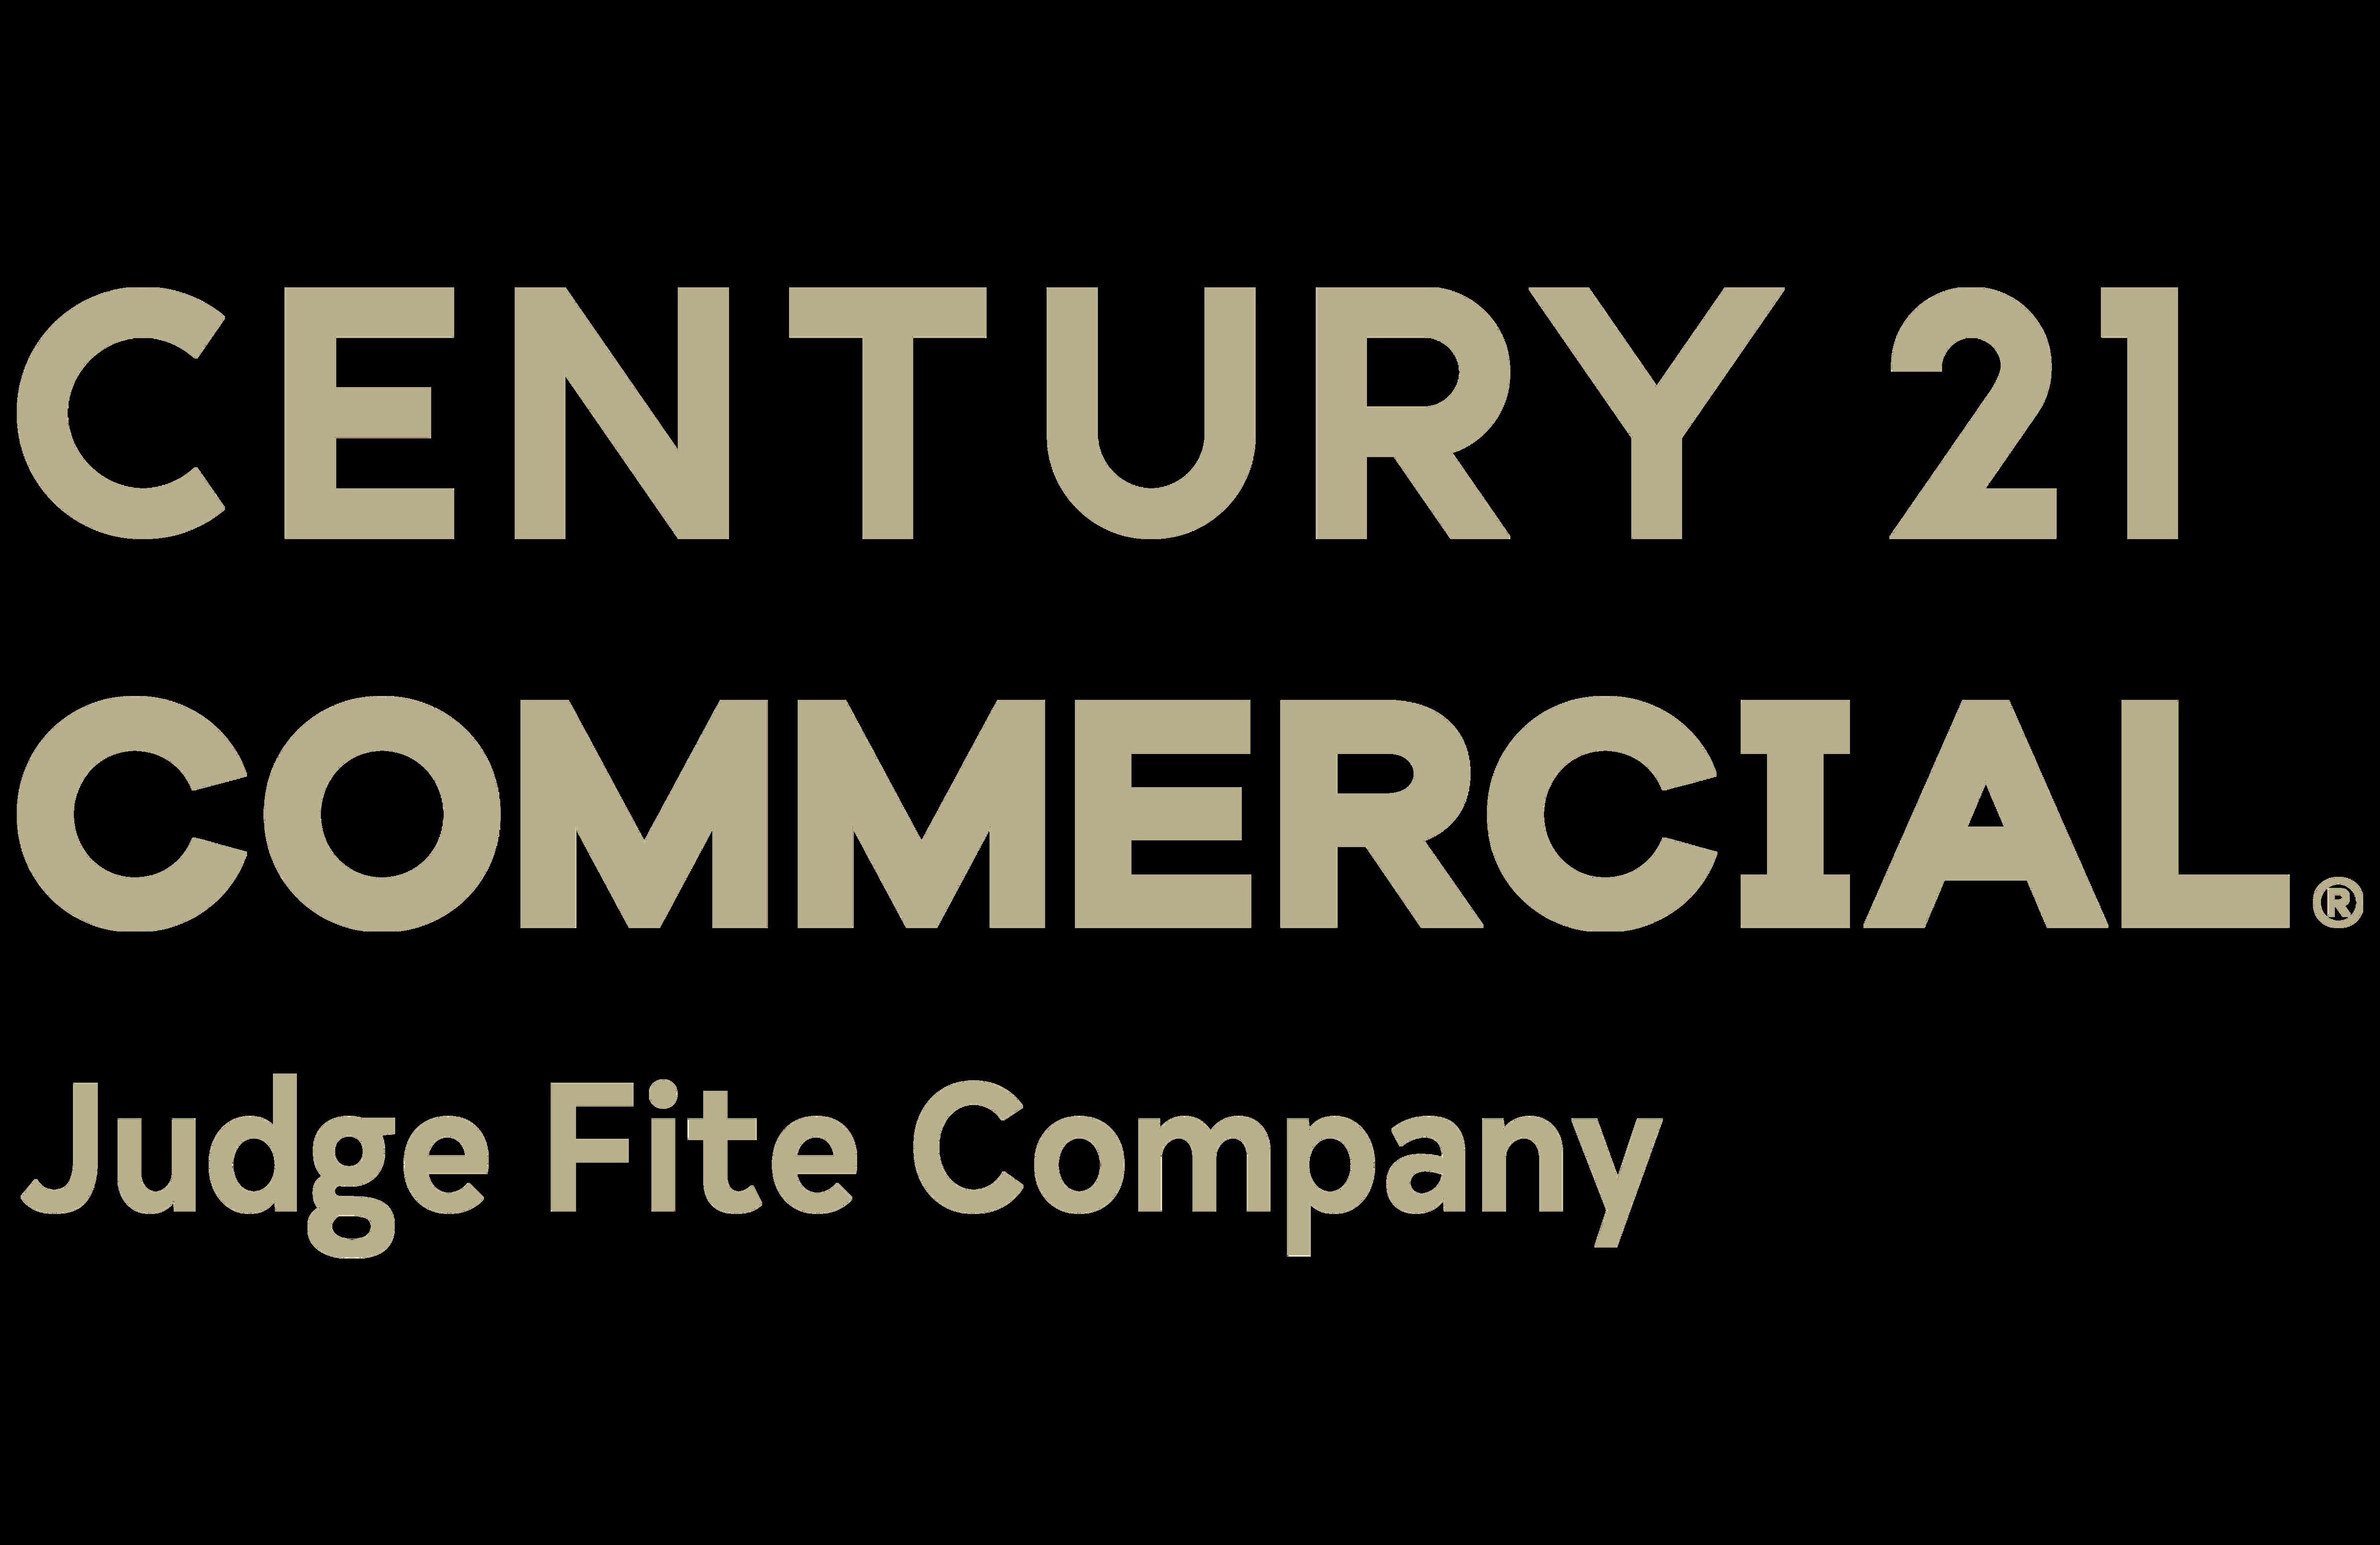 Barbara Head of CENTURY 21 Judge Fite Company logo